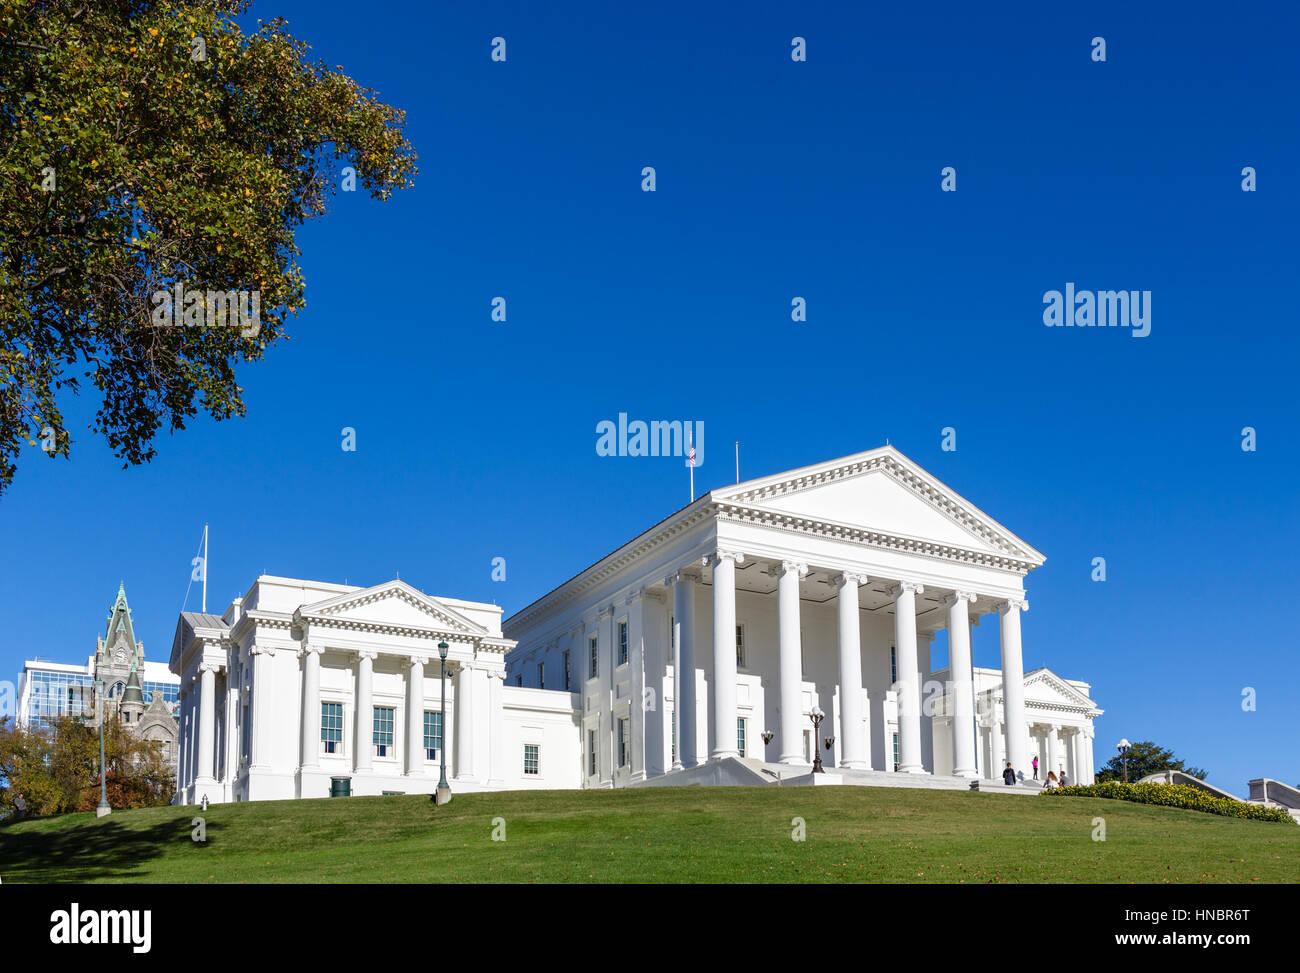 Virginia State Capitol, Richmond, Virginia Photo Stock